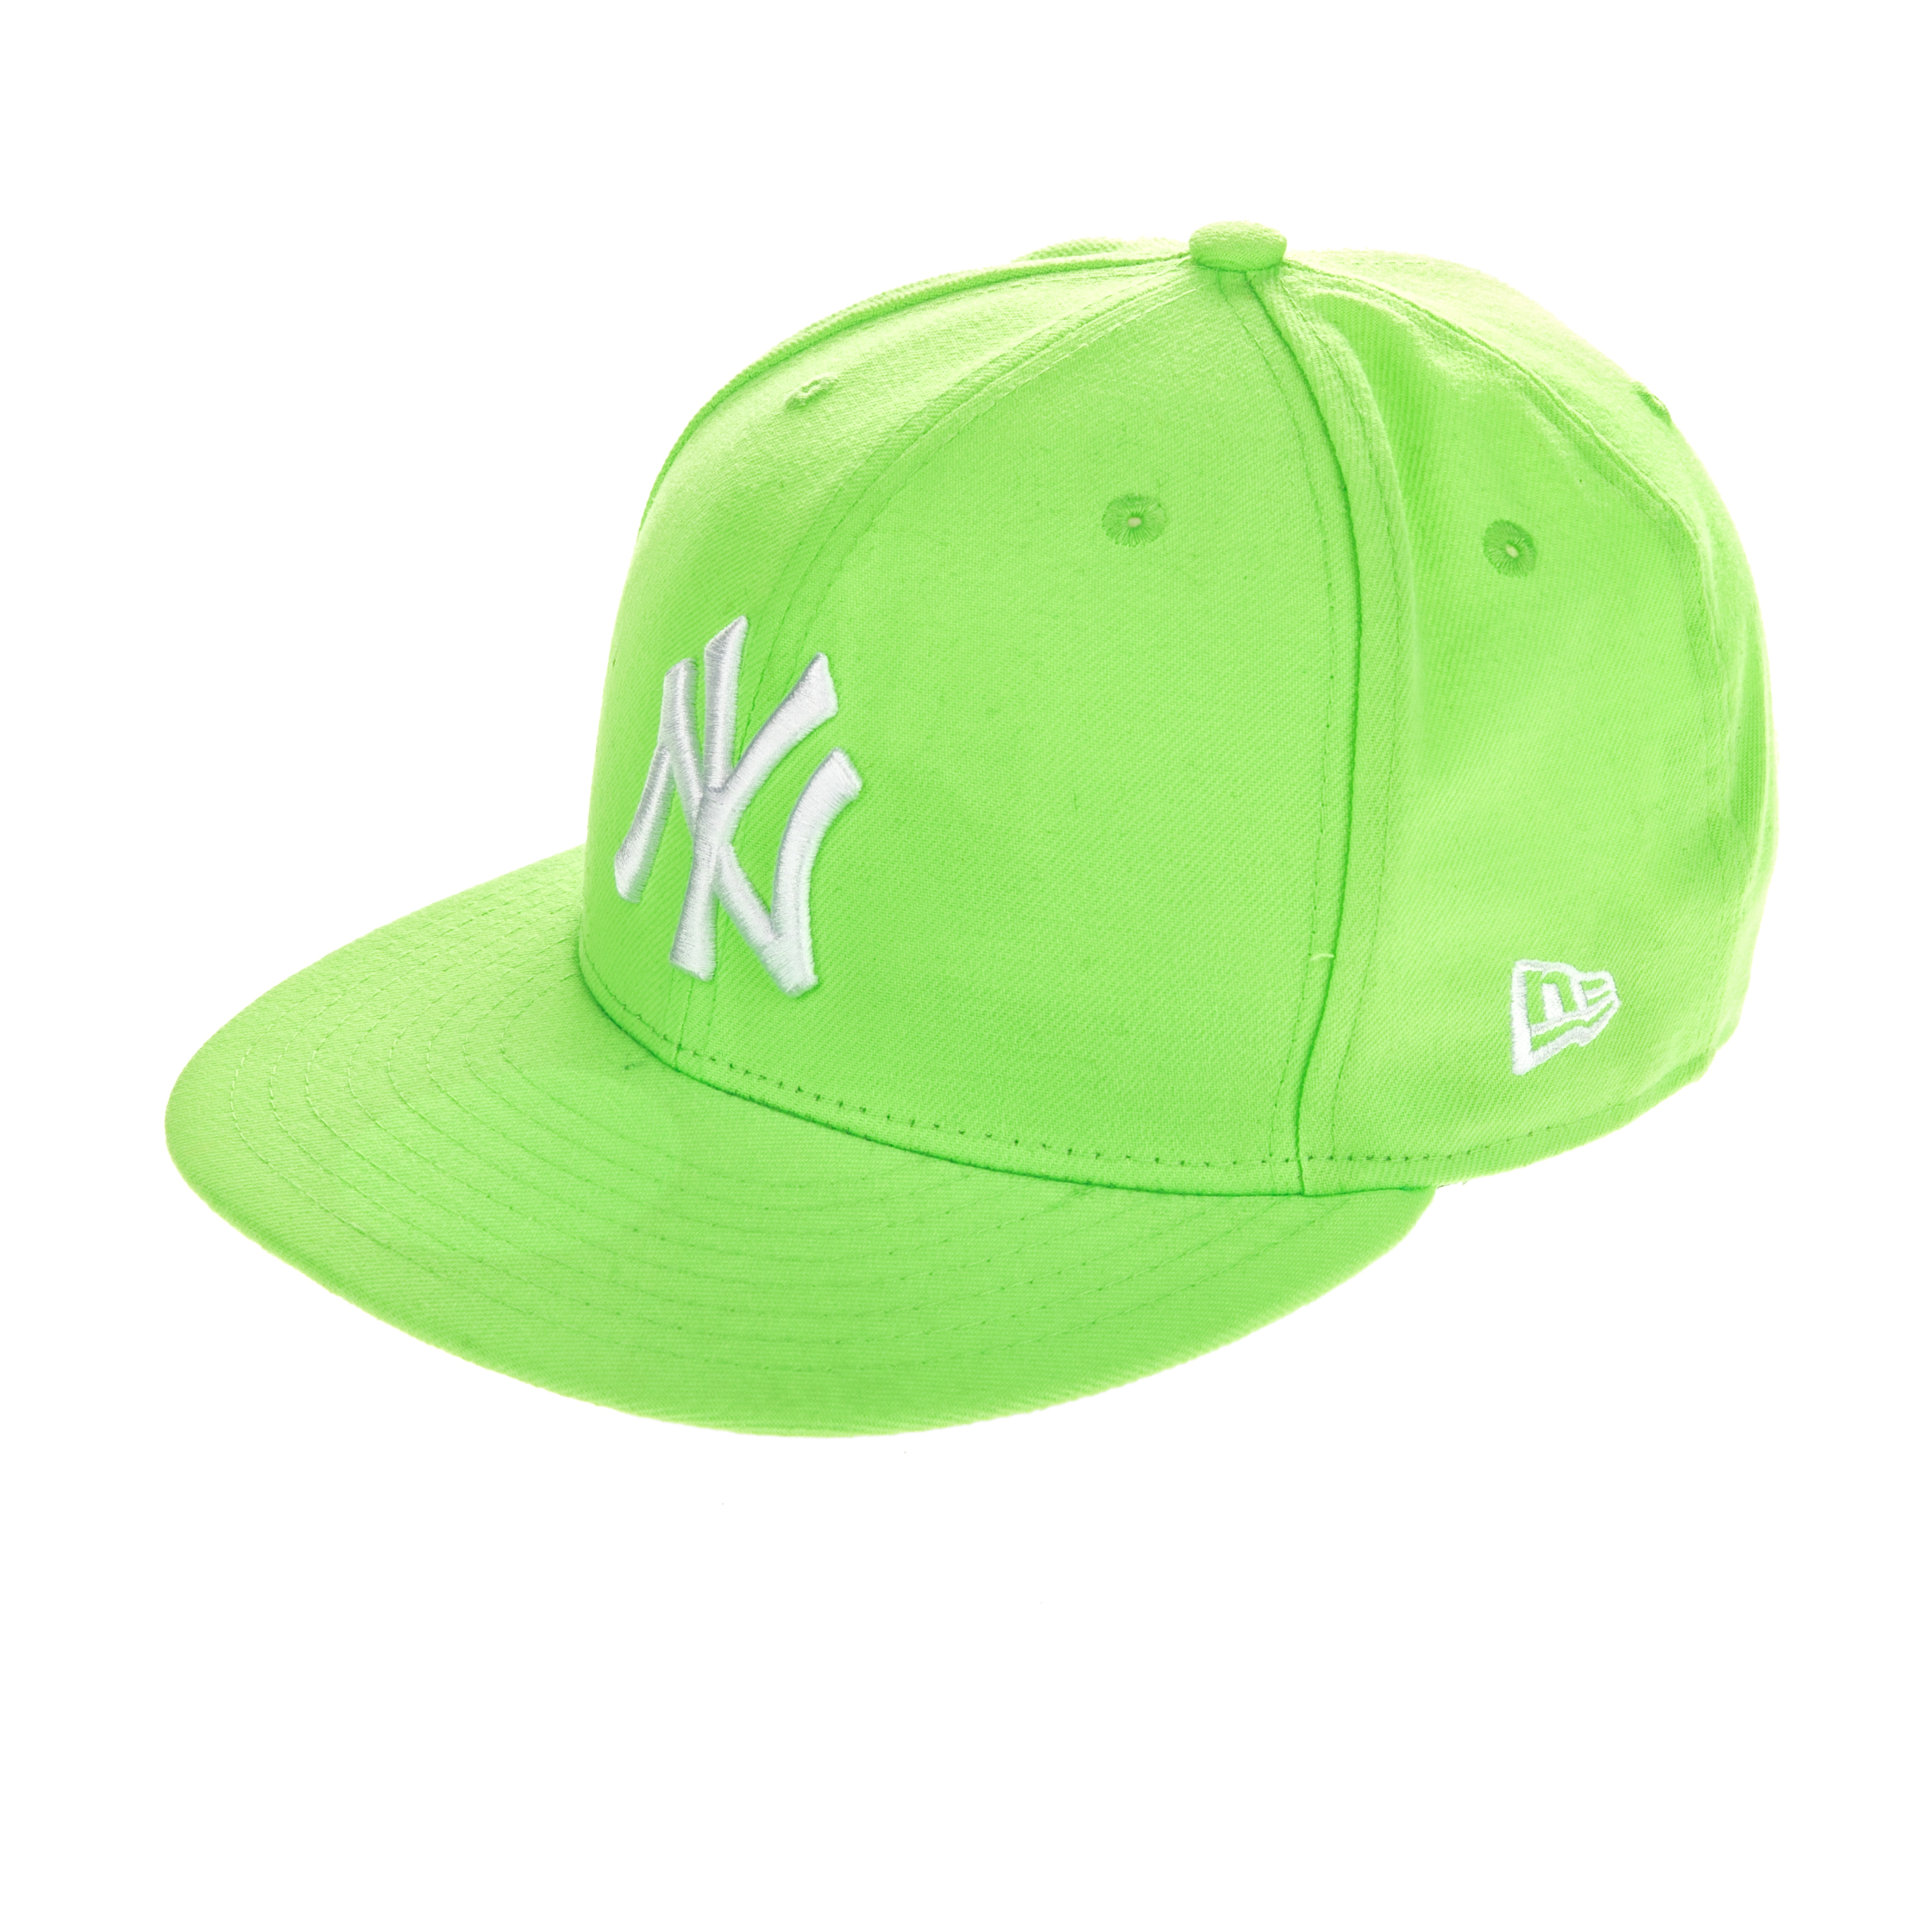 NEW ERA - Unisex καπέλο NEW ERA LEAGUE BASIC πράσινο